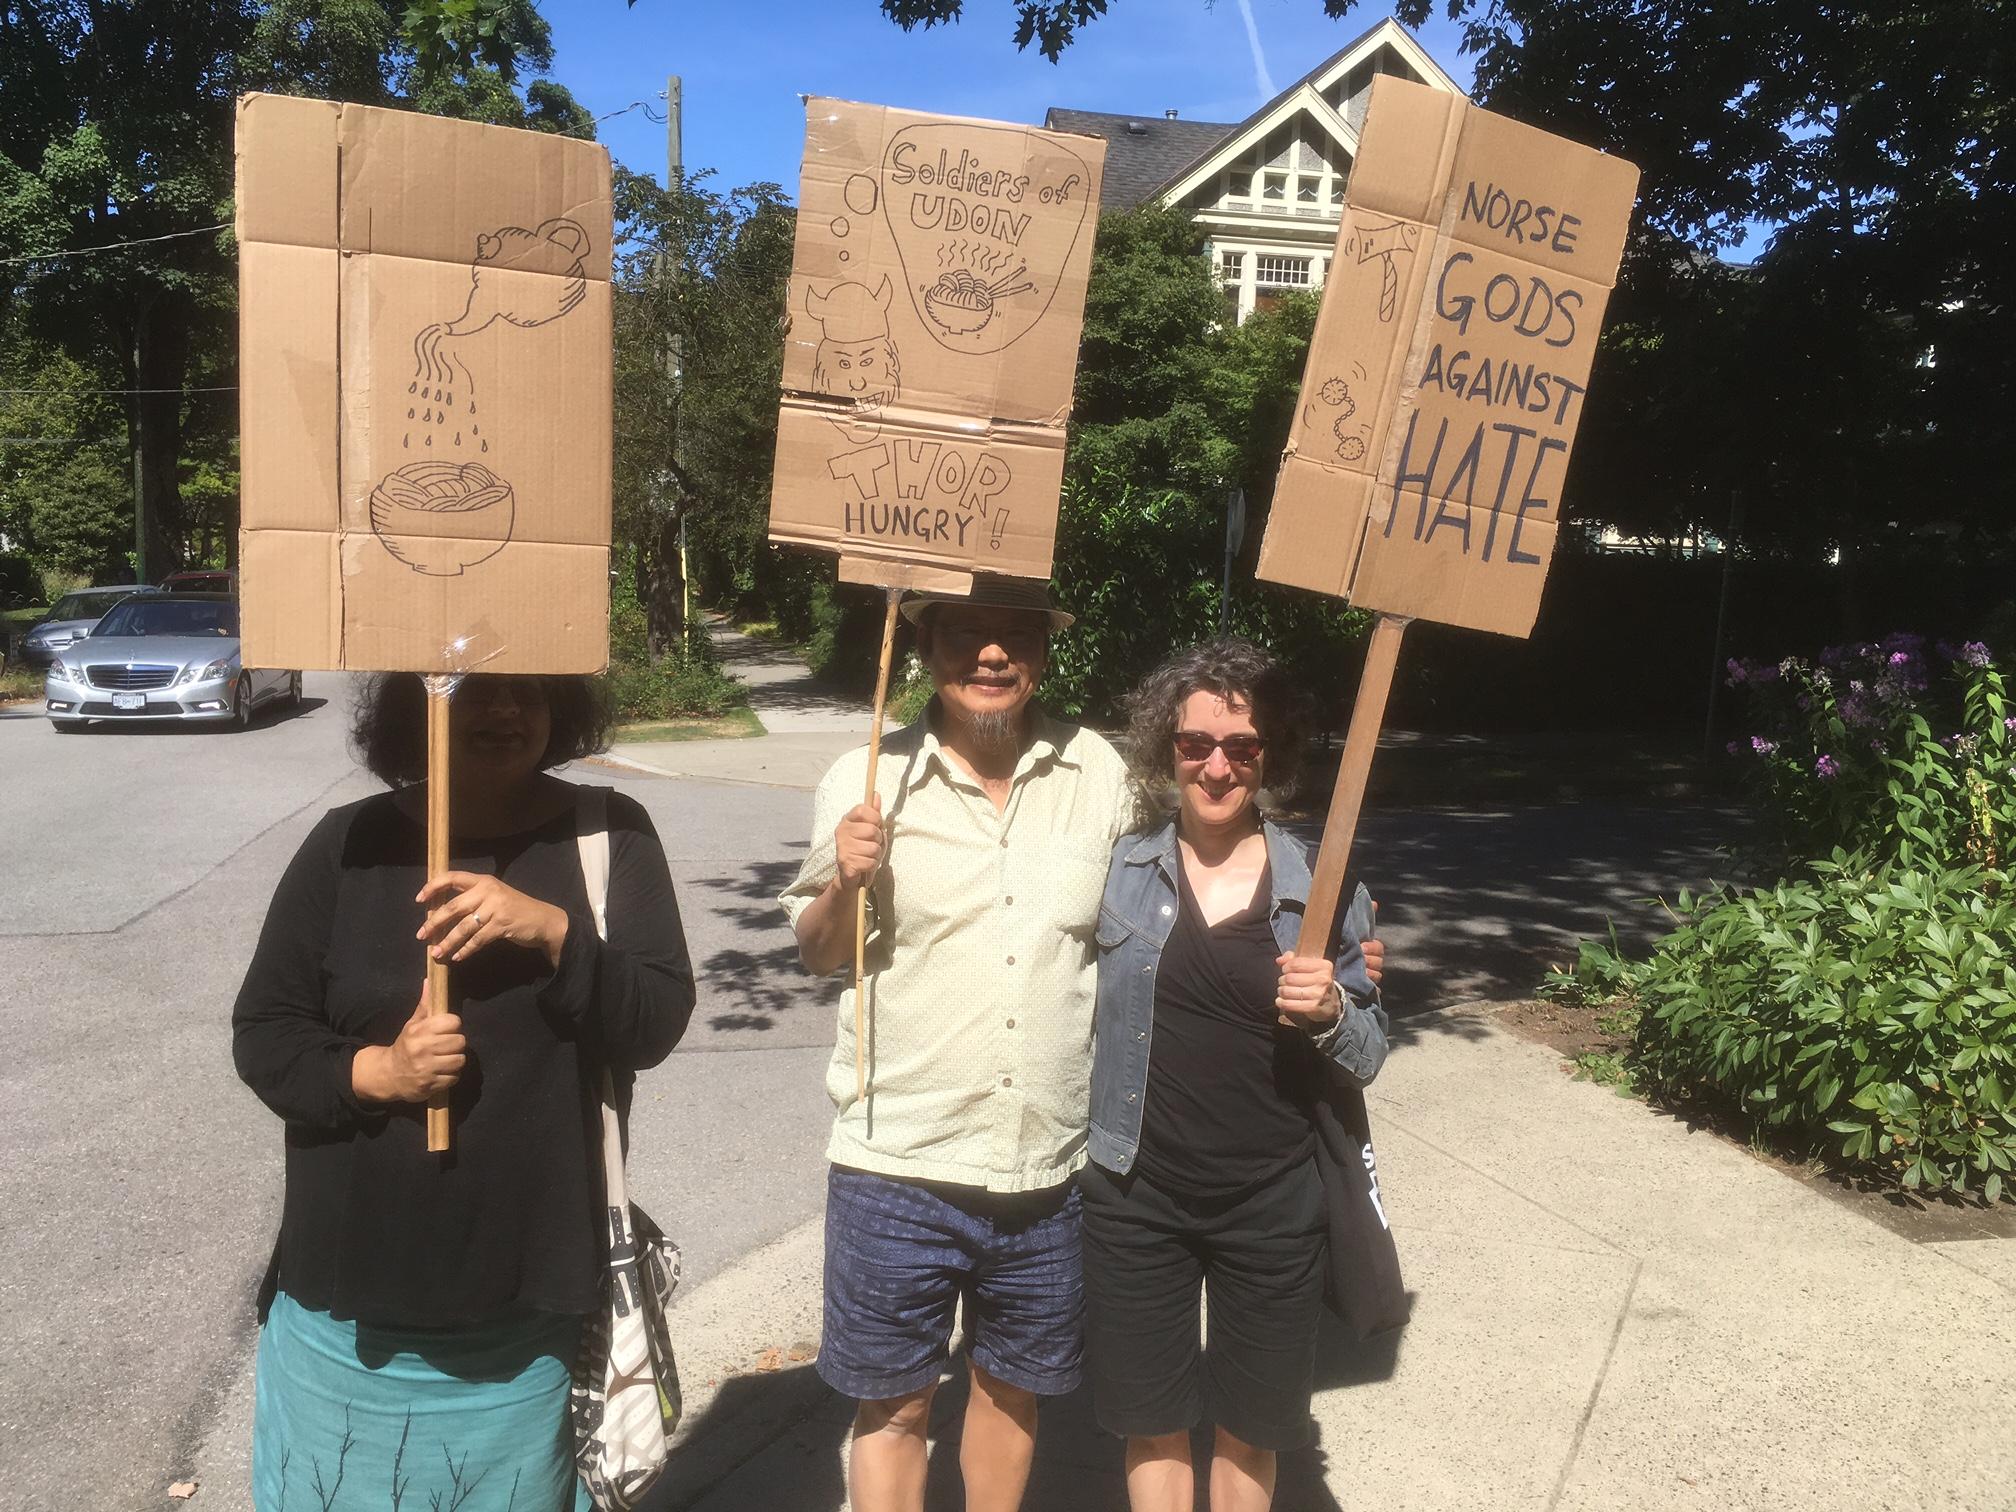 Anti racist protest pics - August 19, 2017 (2).JPG